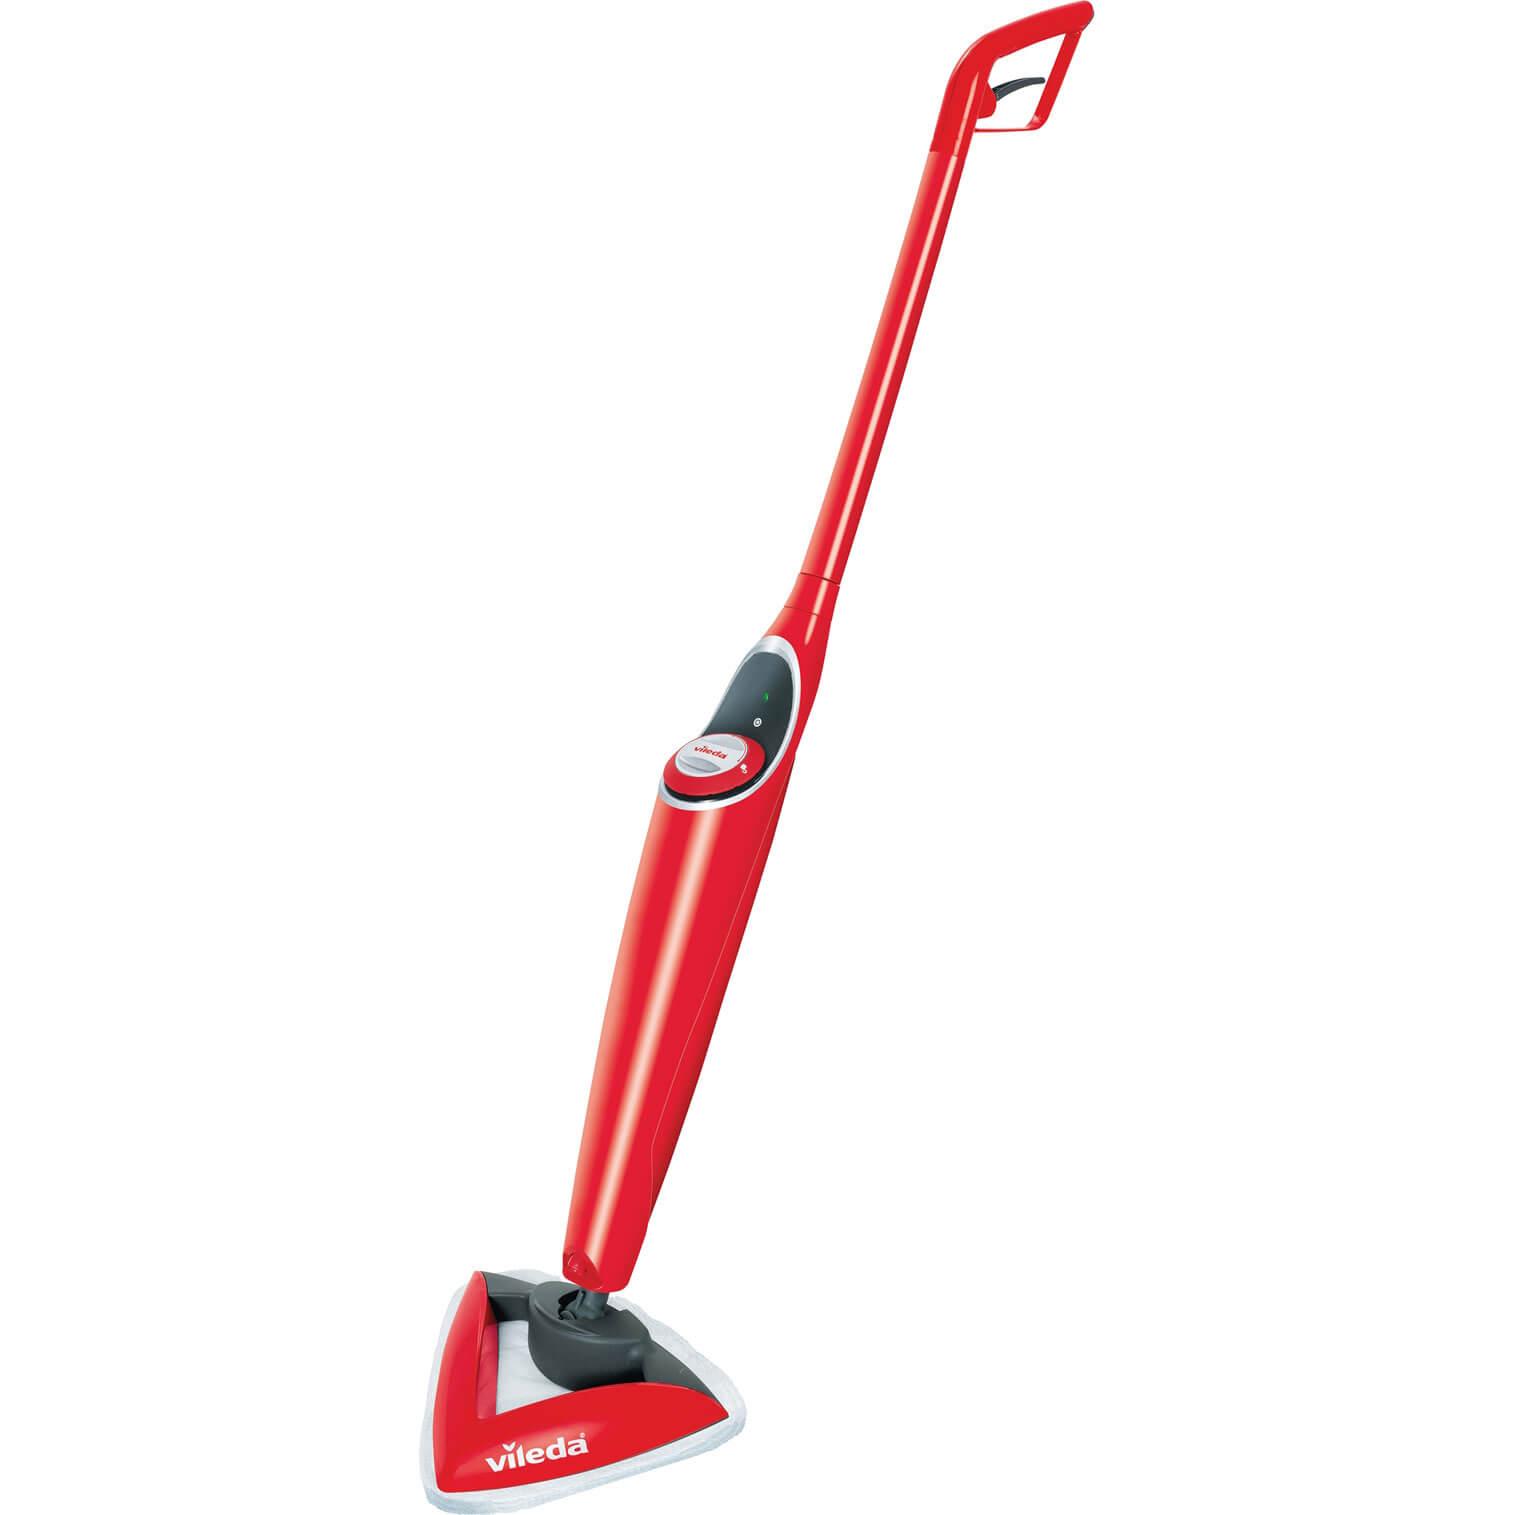 Image of Vileda Hot Spray Mop 0.25L 1200w 240v